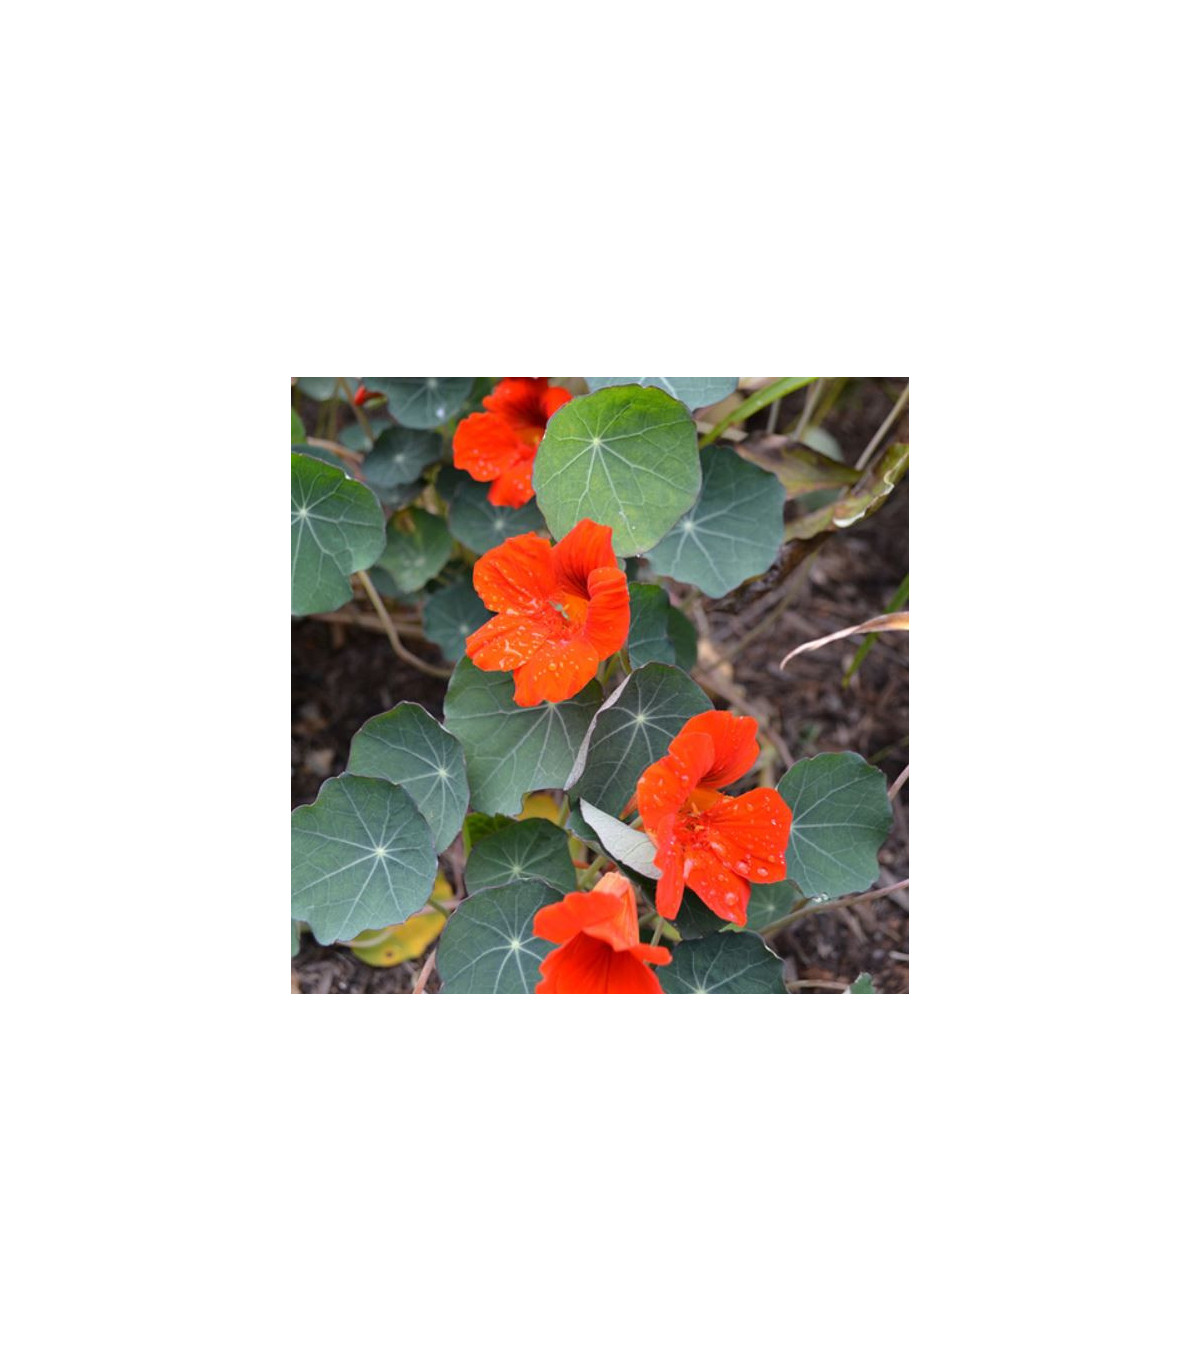 Lichořeřišnice nízká Empress of India - Tropaeolum minus - semena - 15 ks